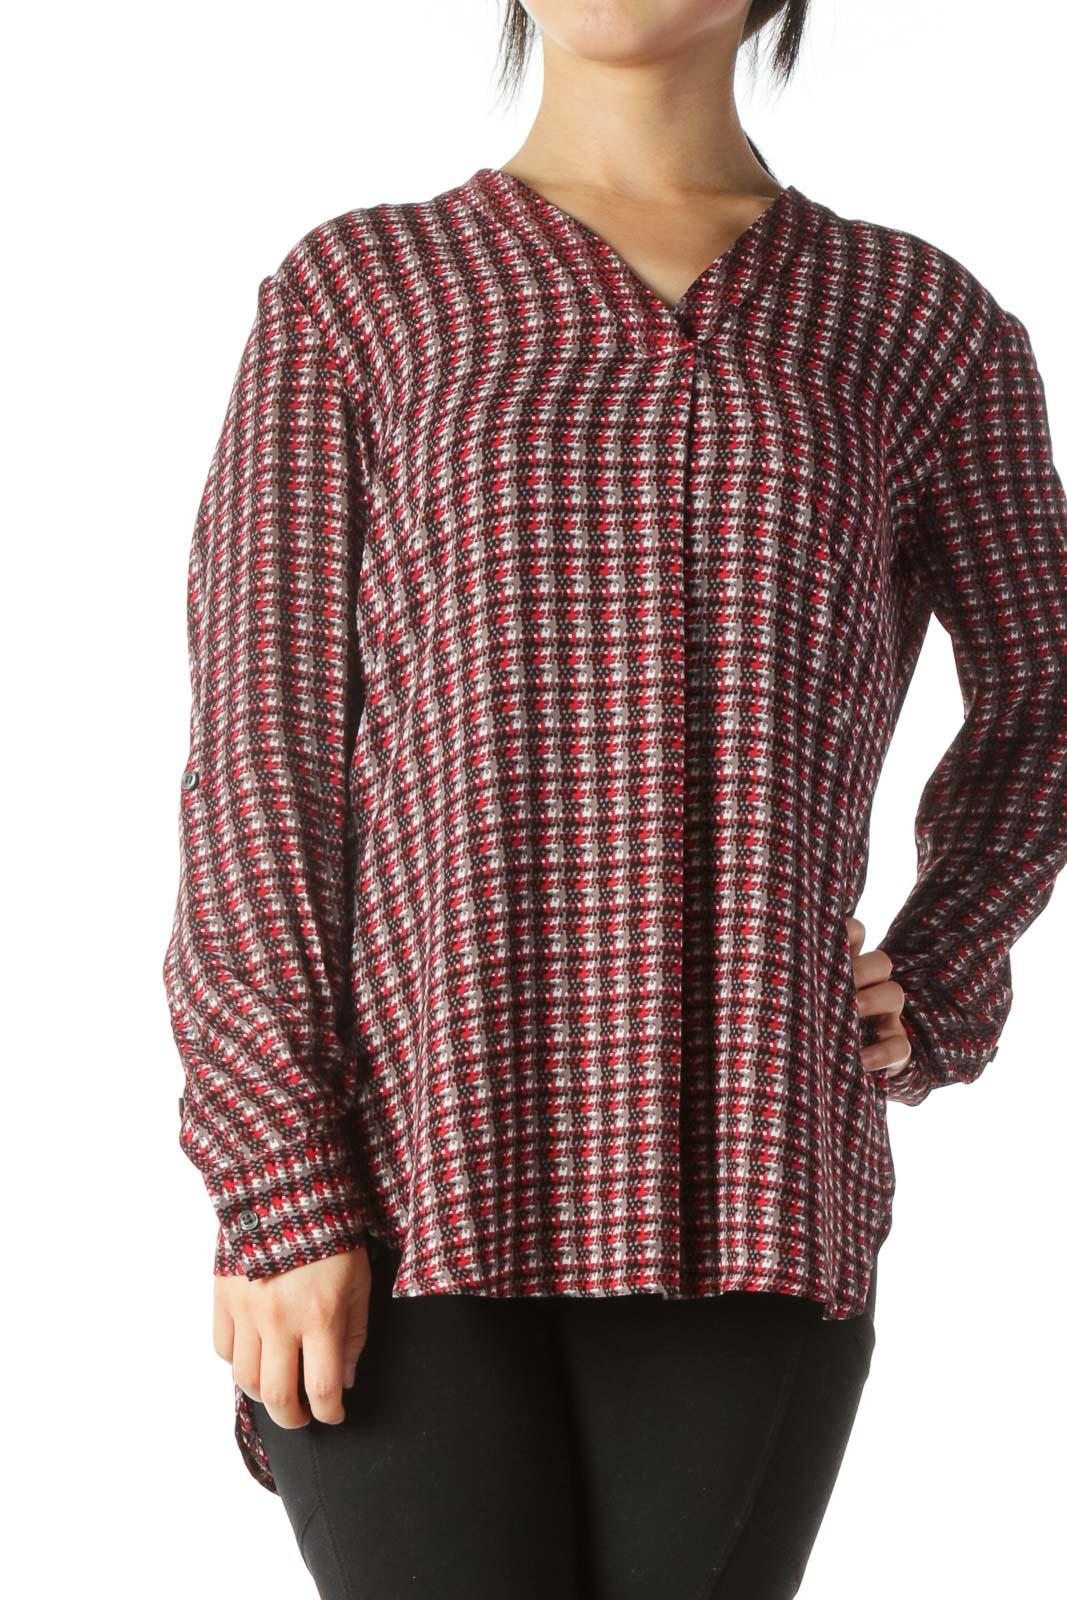 Multicolor Printed V-Neck Long-Sleeve Shirt Front